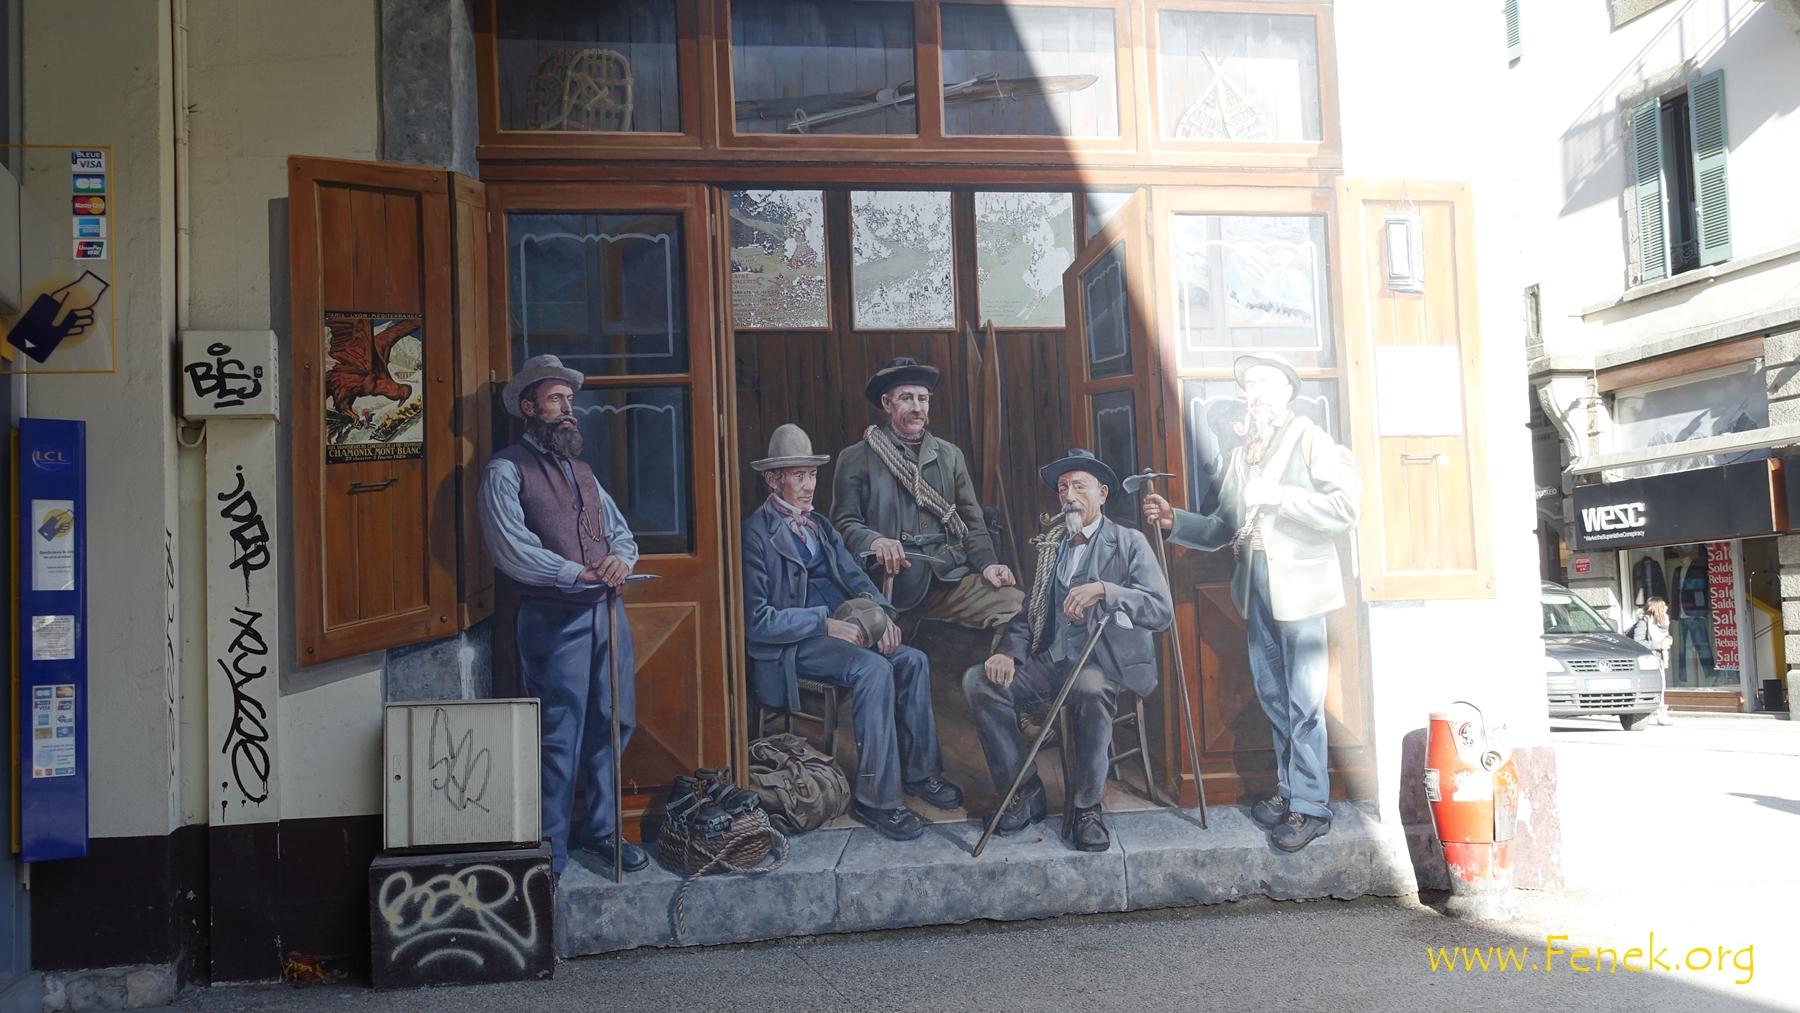 Fassade in Chamonix